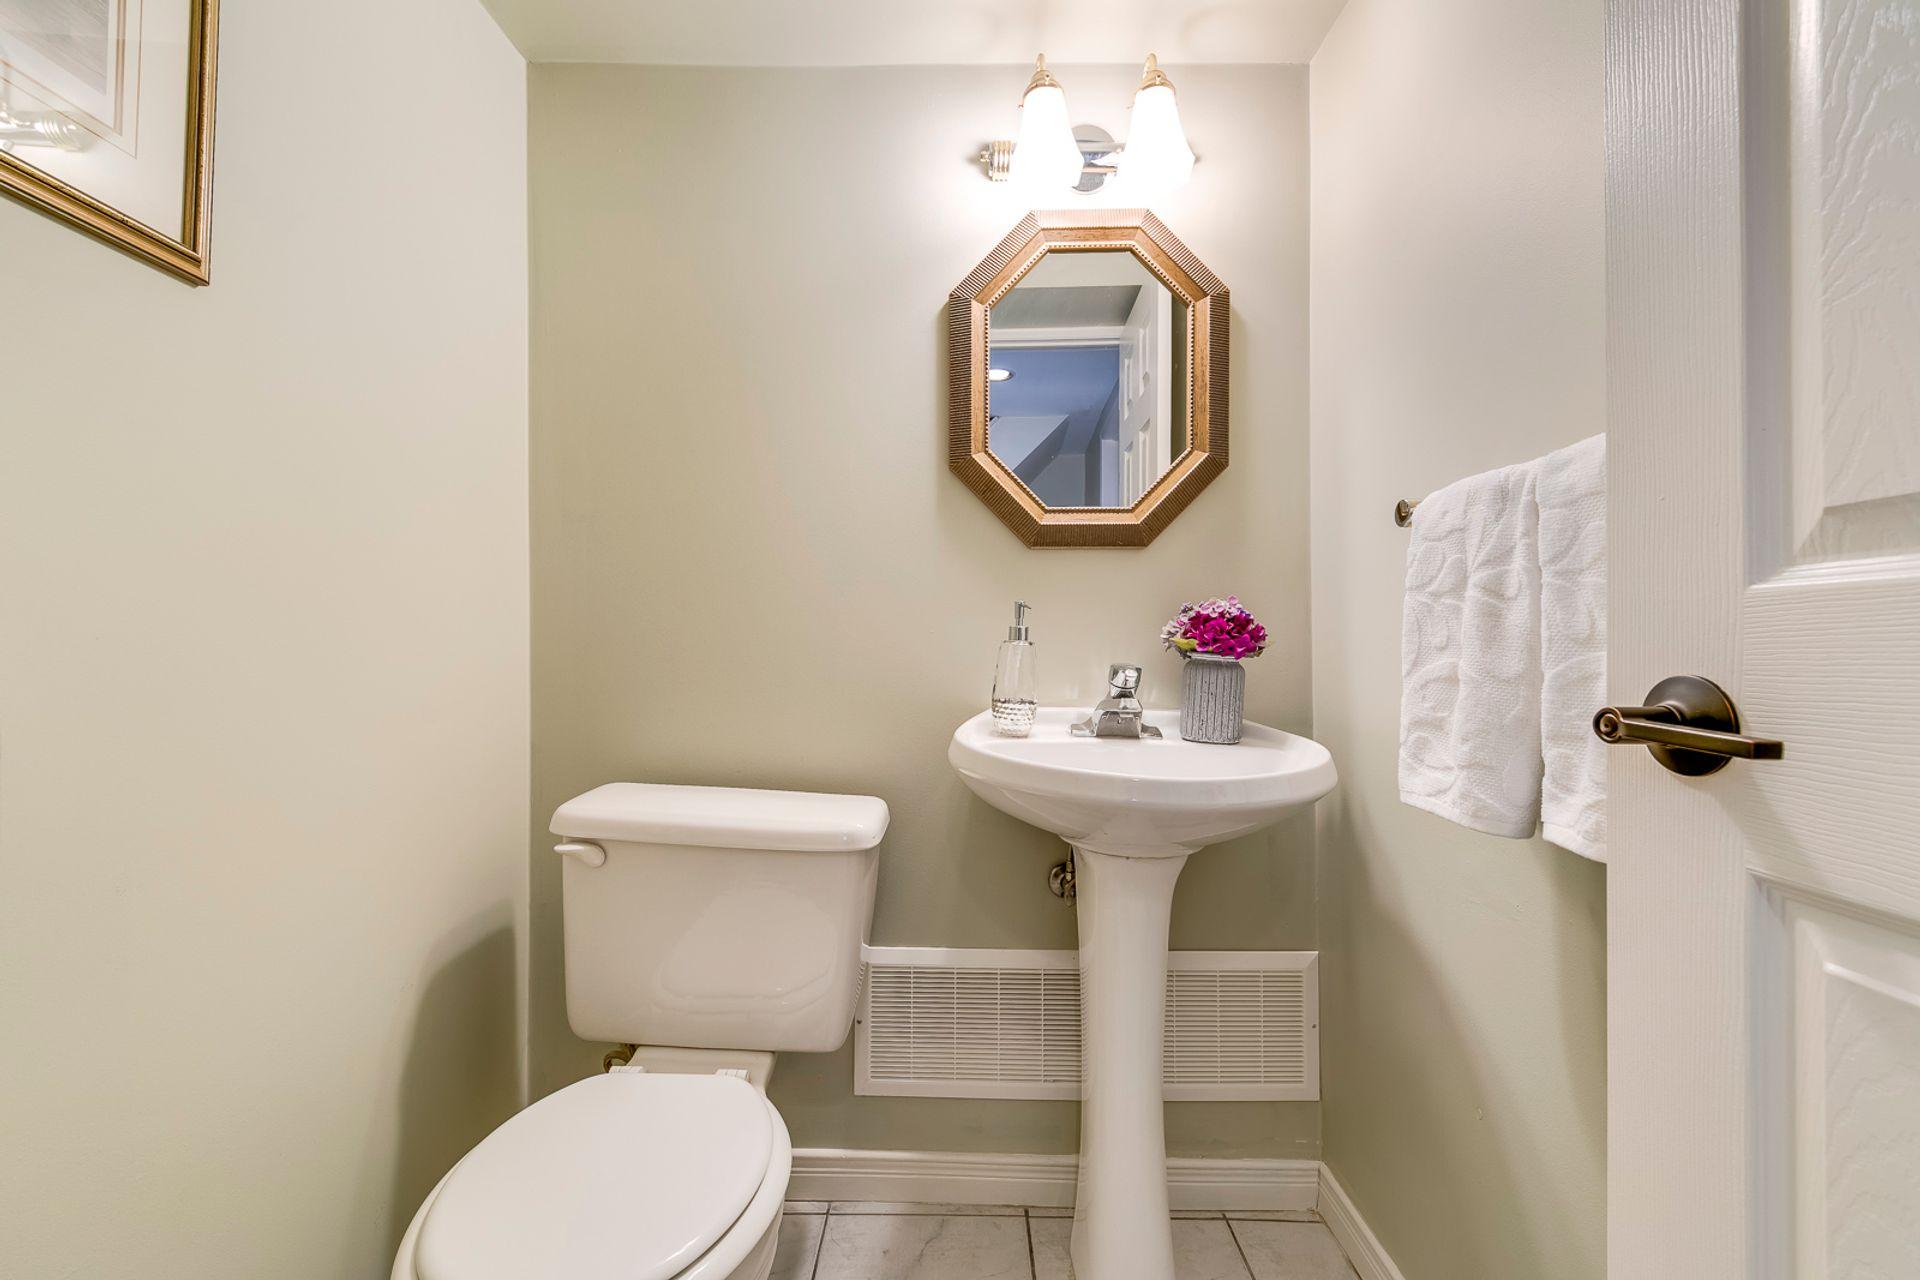 Basement Bathroom - 2275 Daffodil Court, Oakville - Elite3 & Team at 2275 Daffodil Court, Eastlake, Oakville